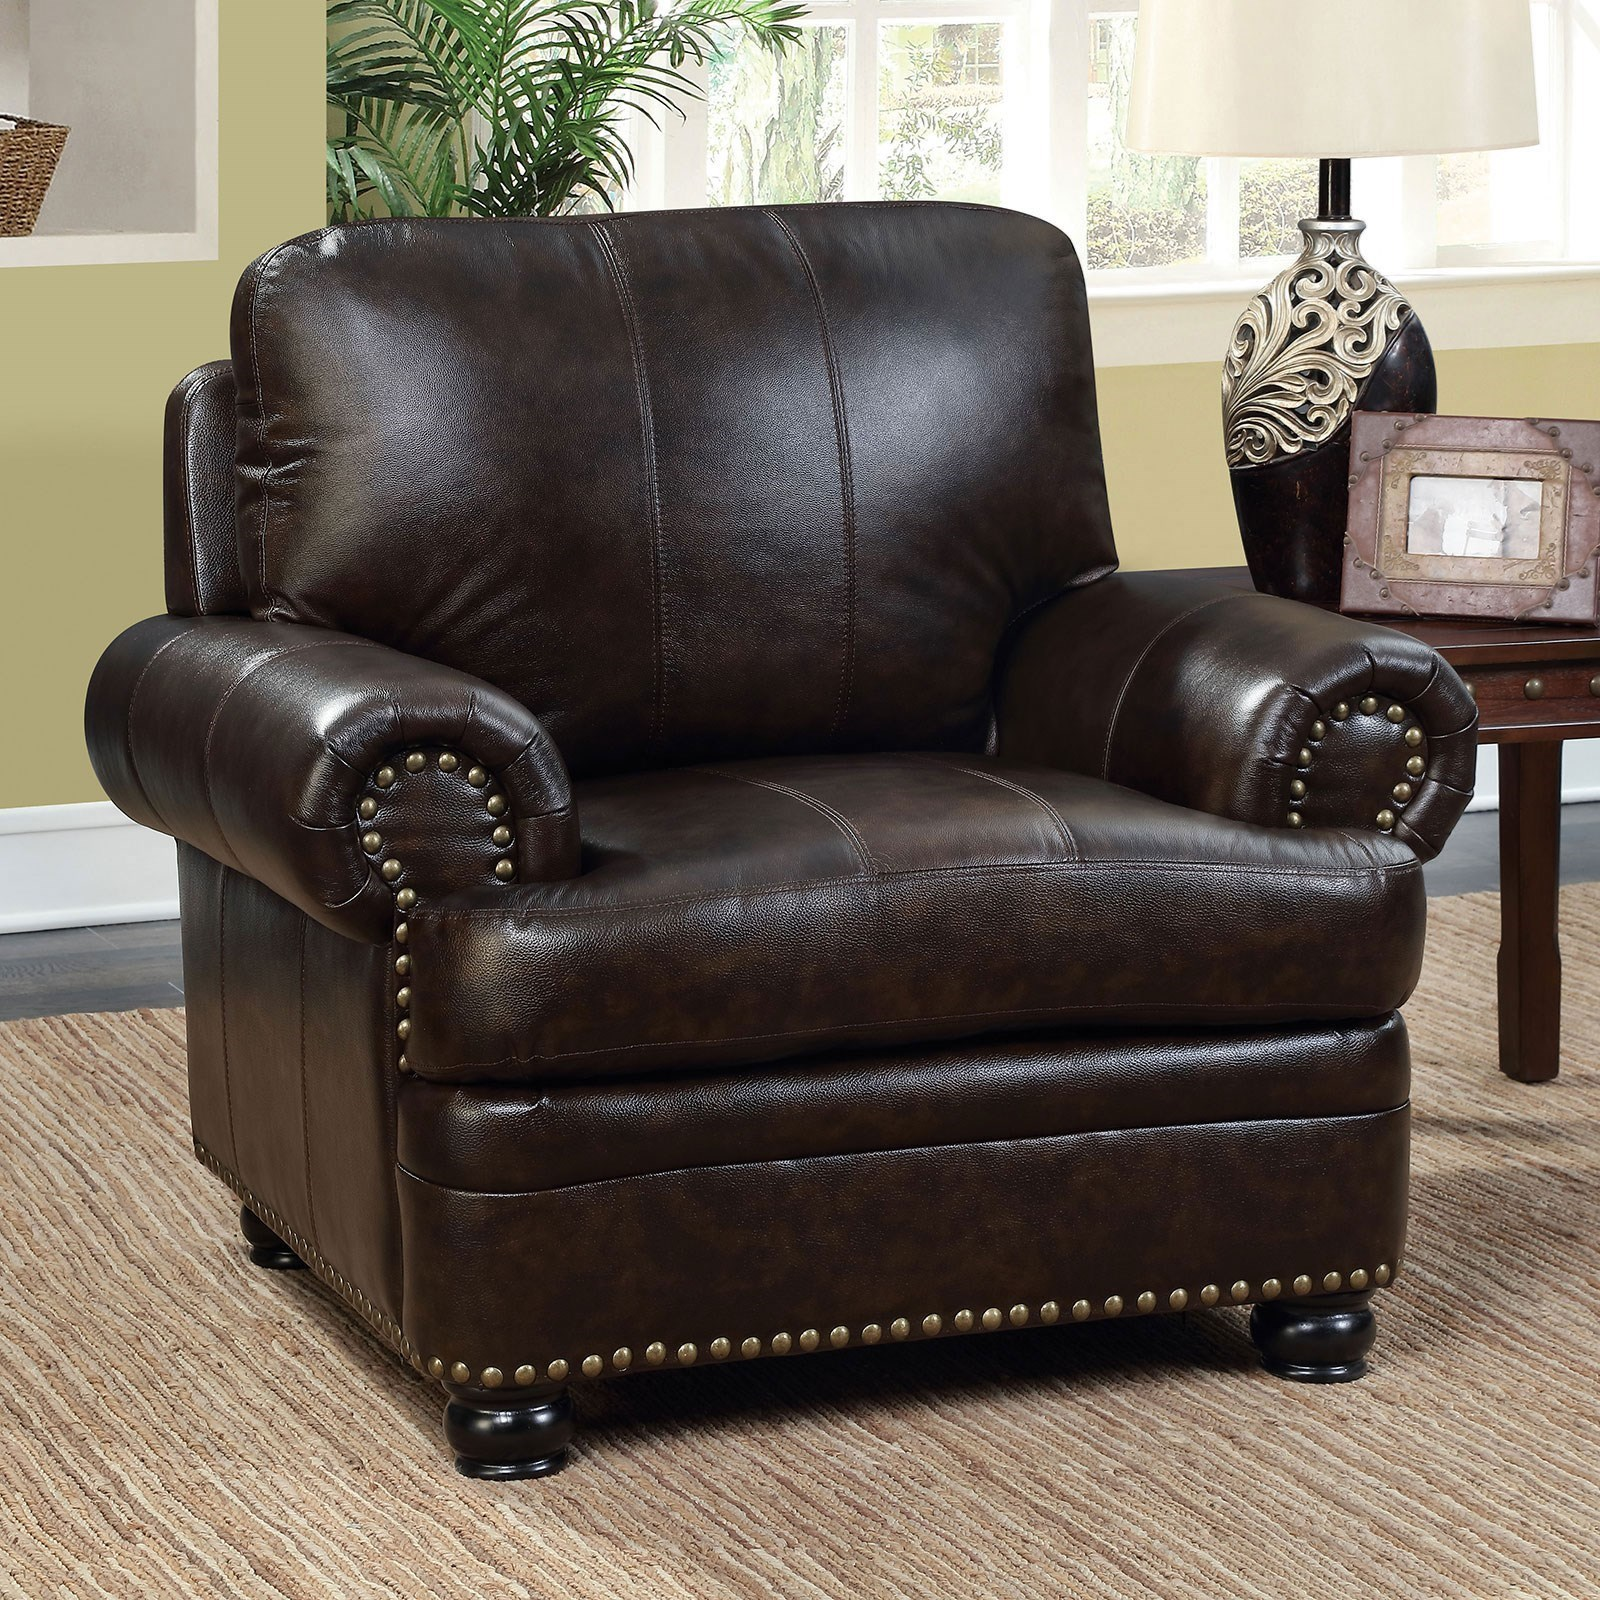 Rheinhardt Chair by Furniture of America at Dream Home Interiors